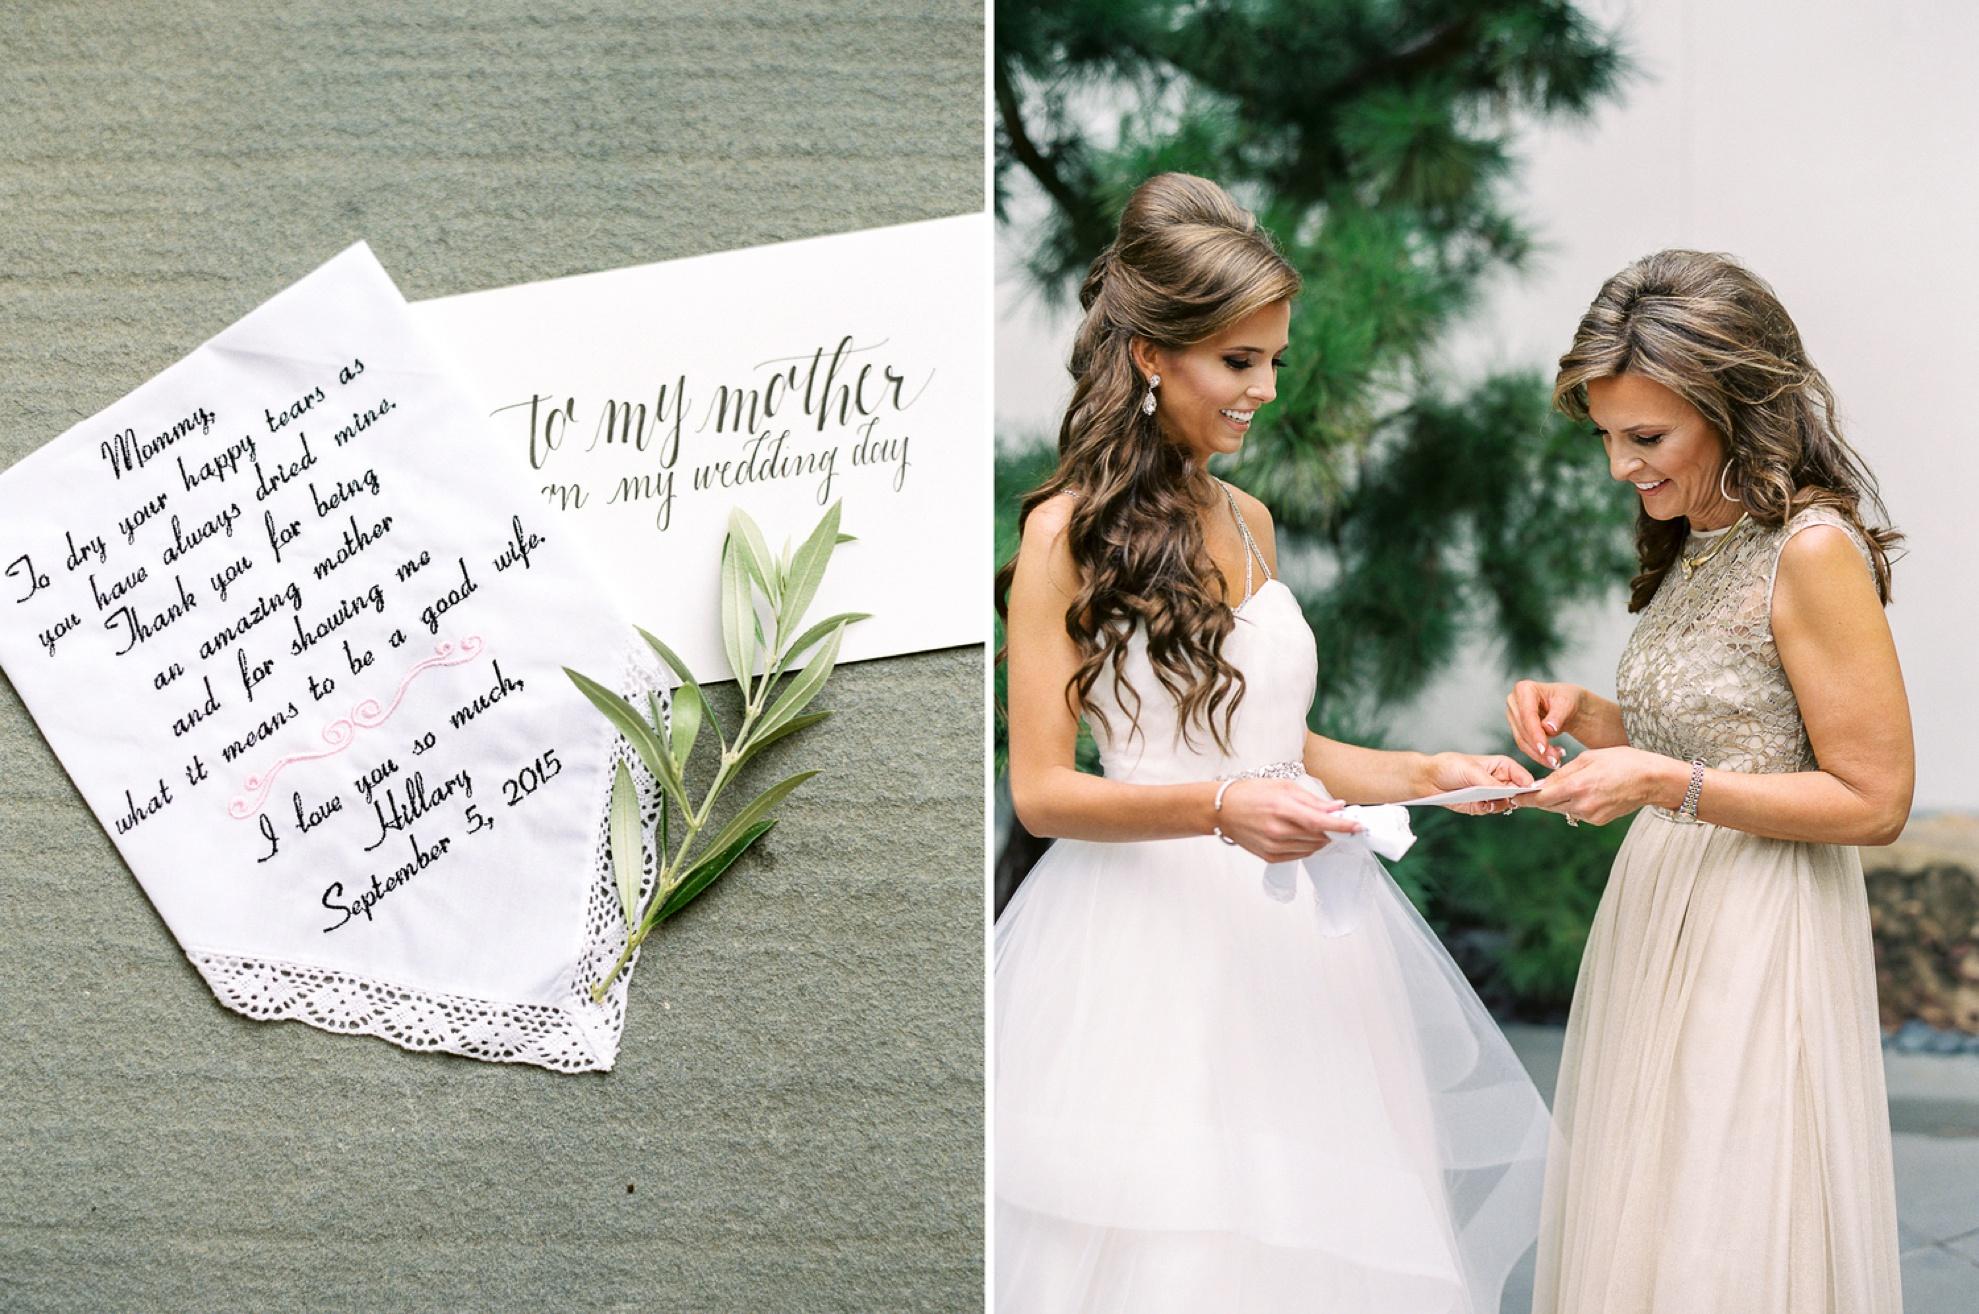 The-Junior-League-Houston-Chapter-Wedding-Reception-Dana-Fernandez-Photography-Film-Venue-4.jpg